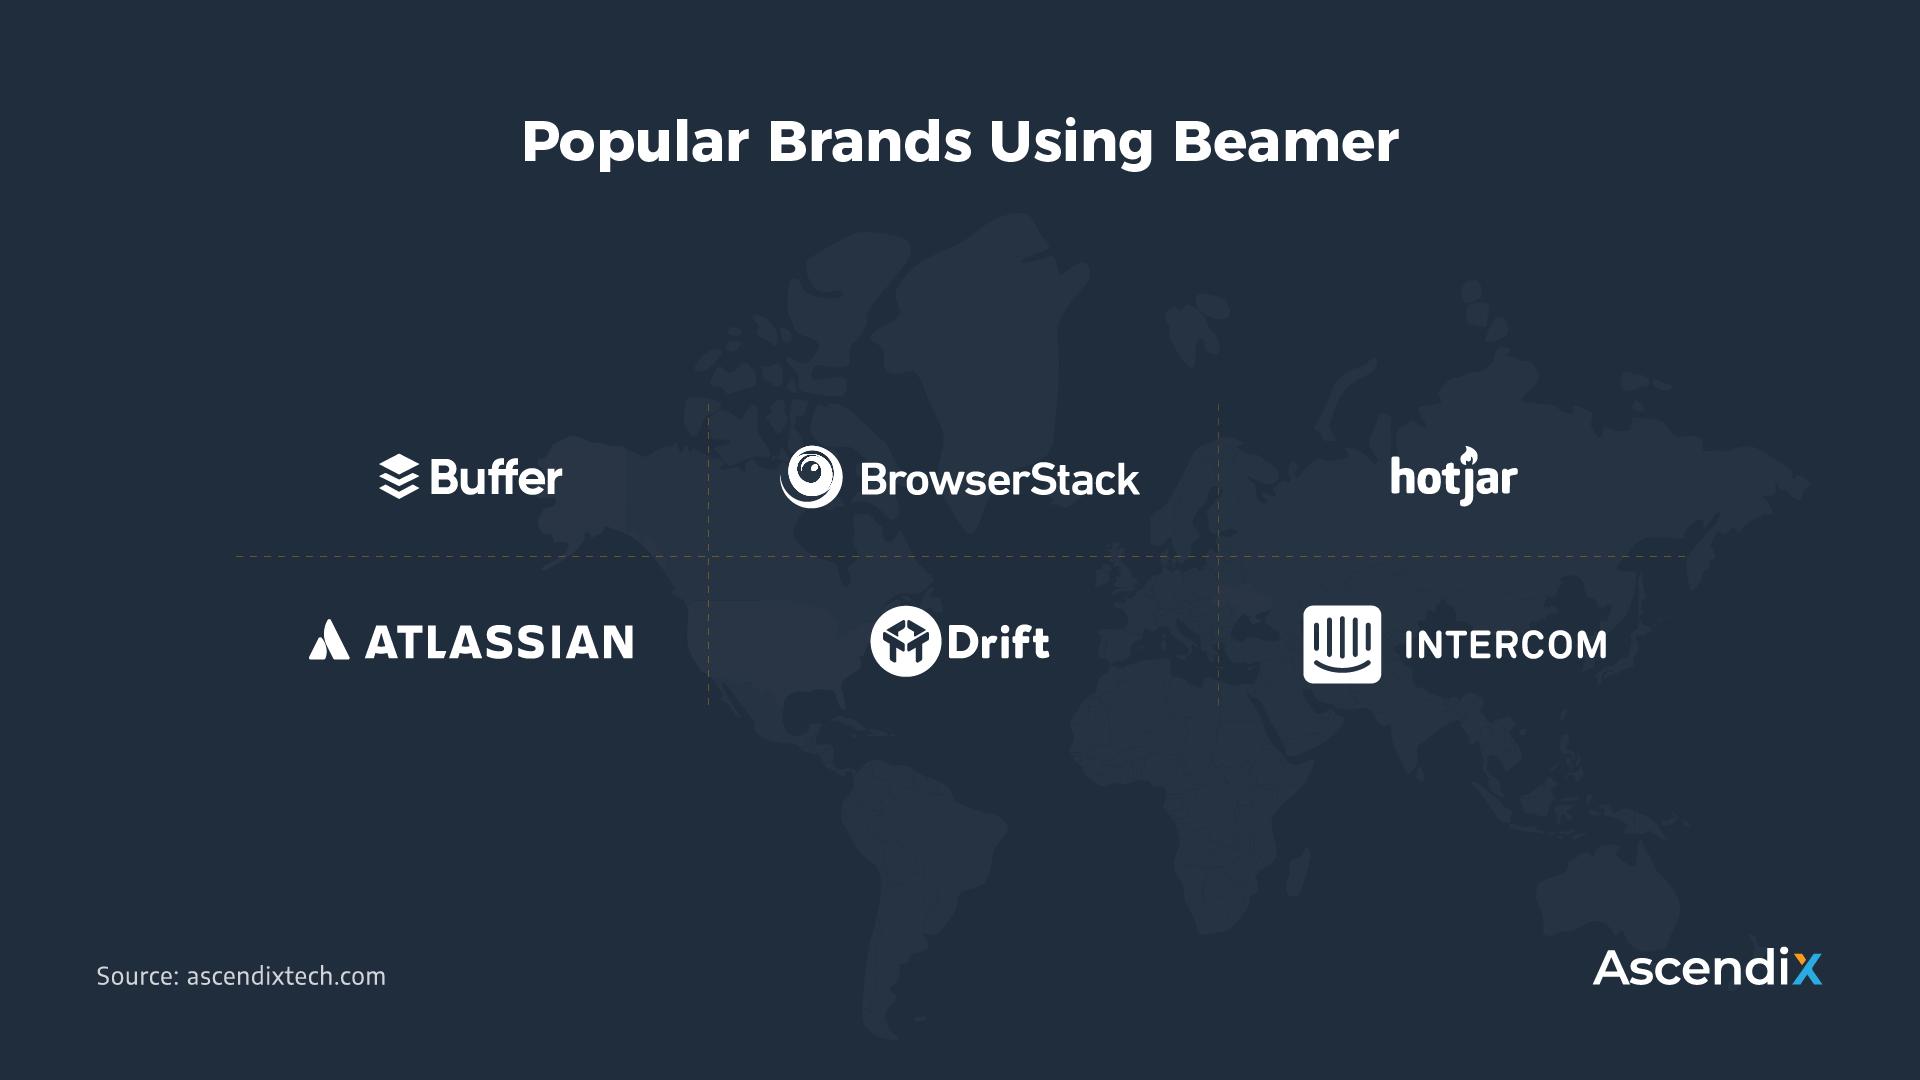 Popular Brands Using Beamer